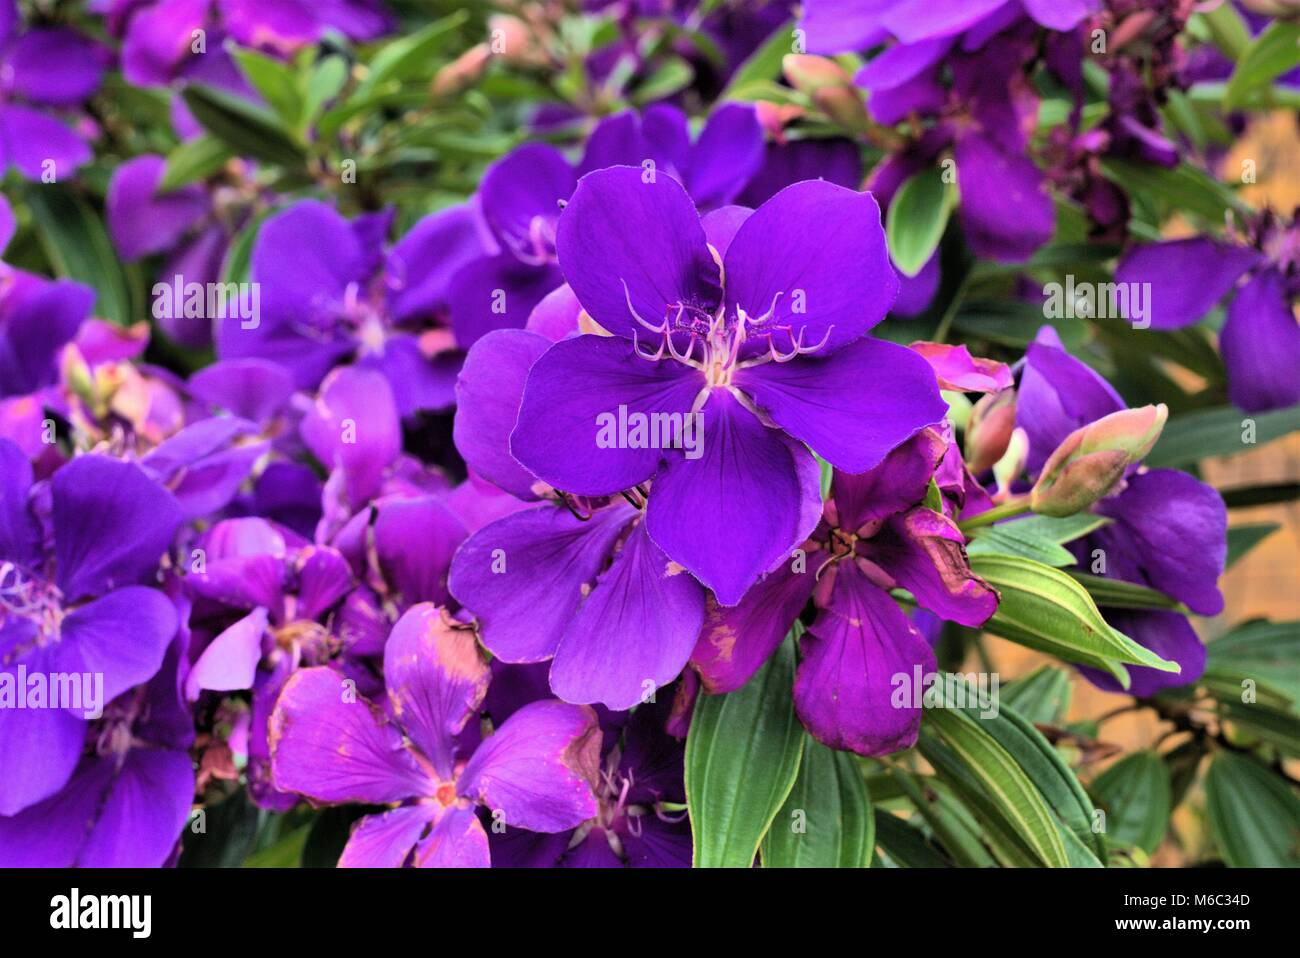 Tibouchinas Flower Or Purple Glory Tree Flower Scientific